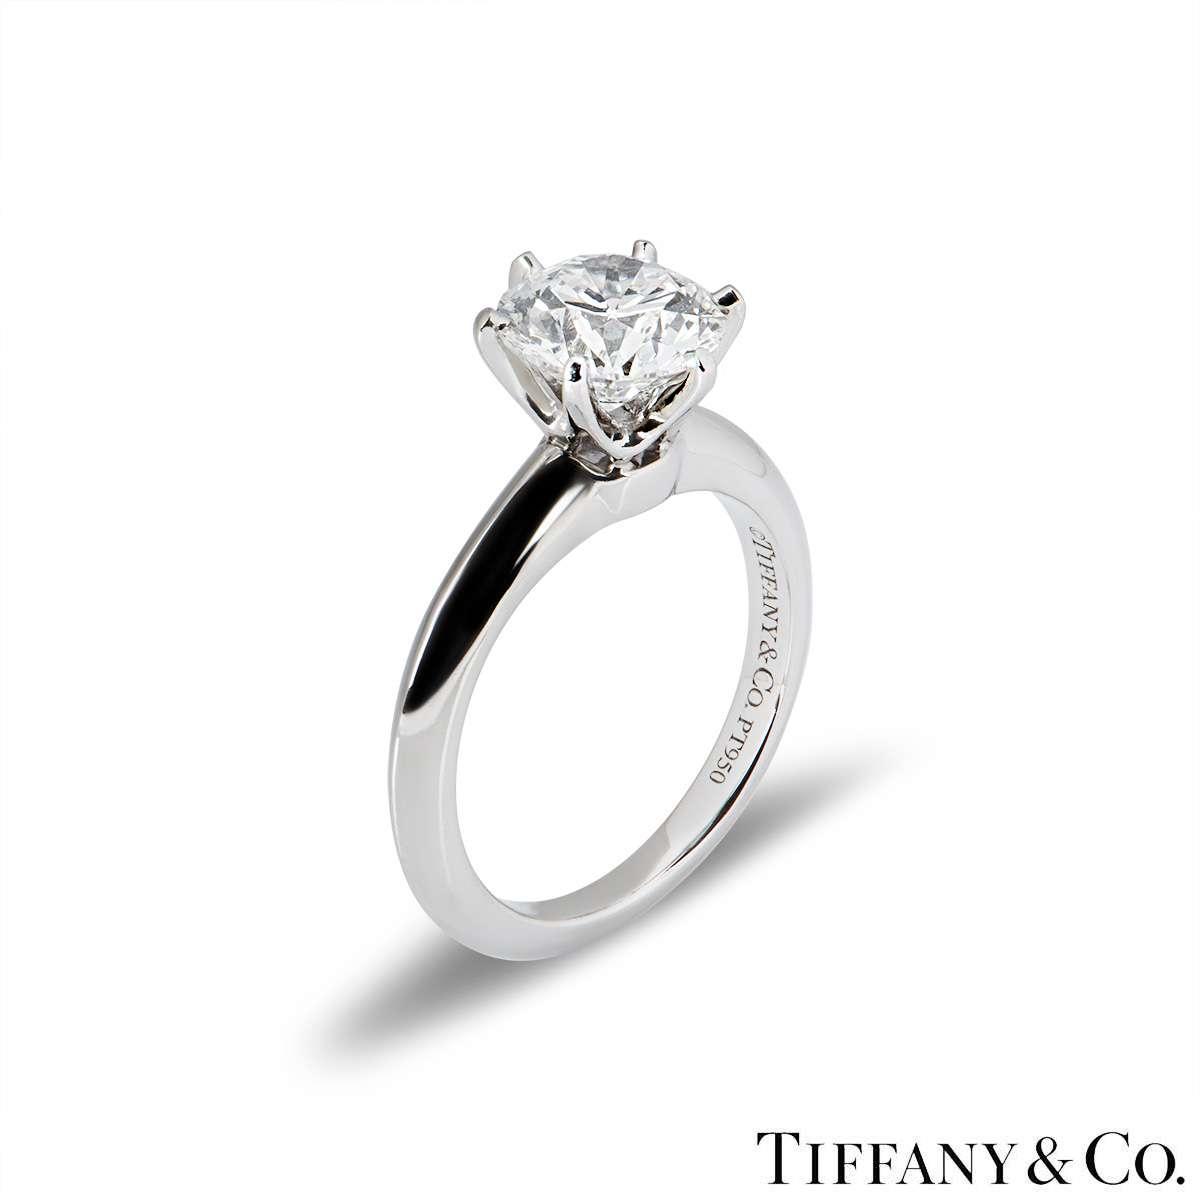 Tiffany & Co. Platinum Diamond Setting Ring 1.72ct G/VVS2 XXX